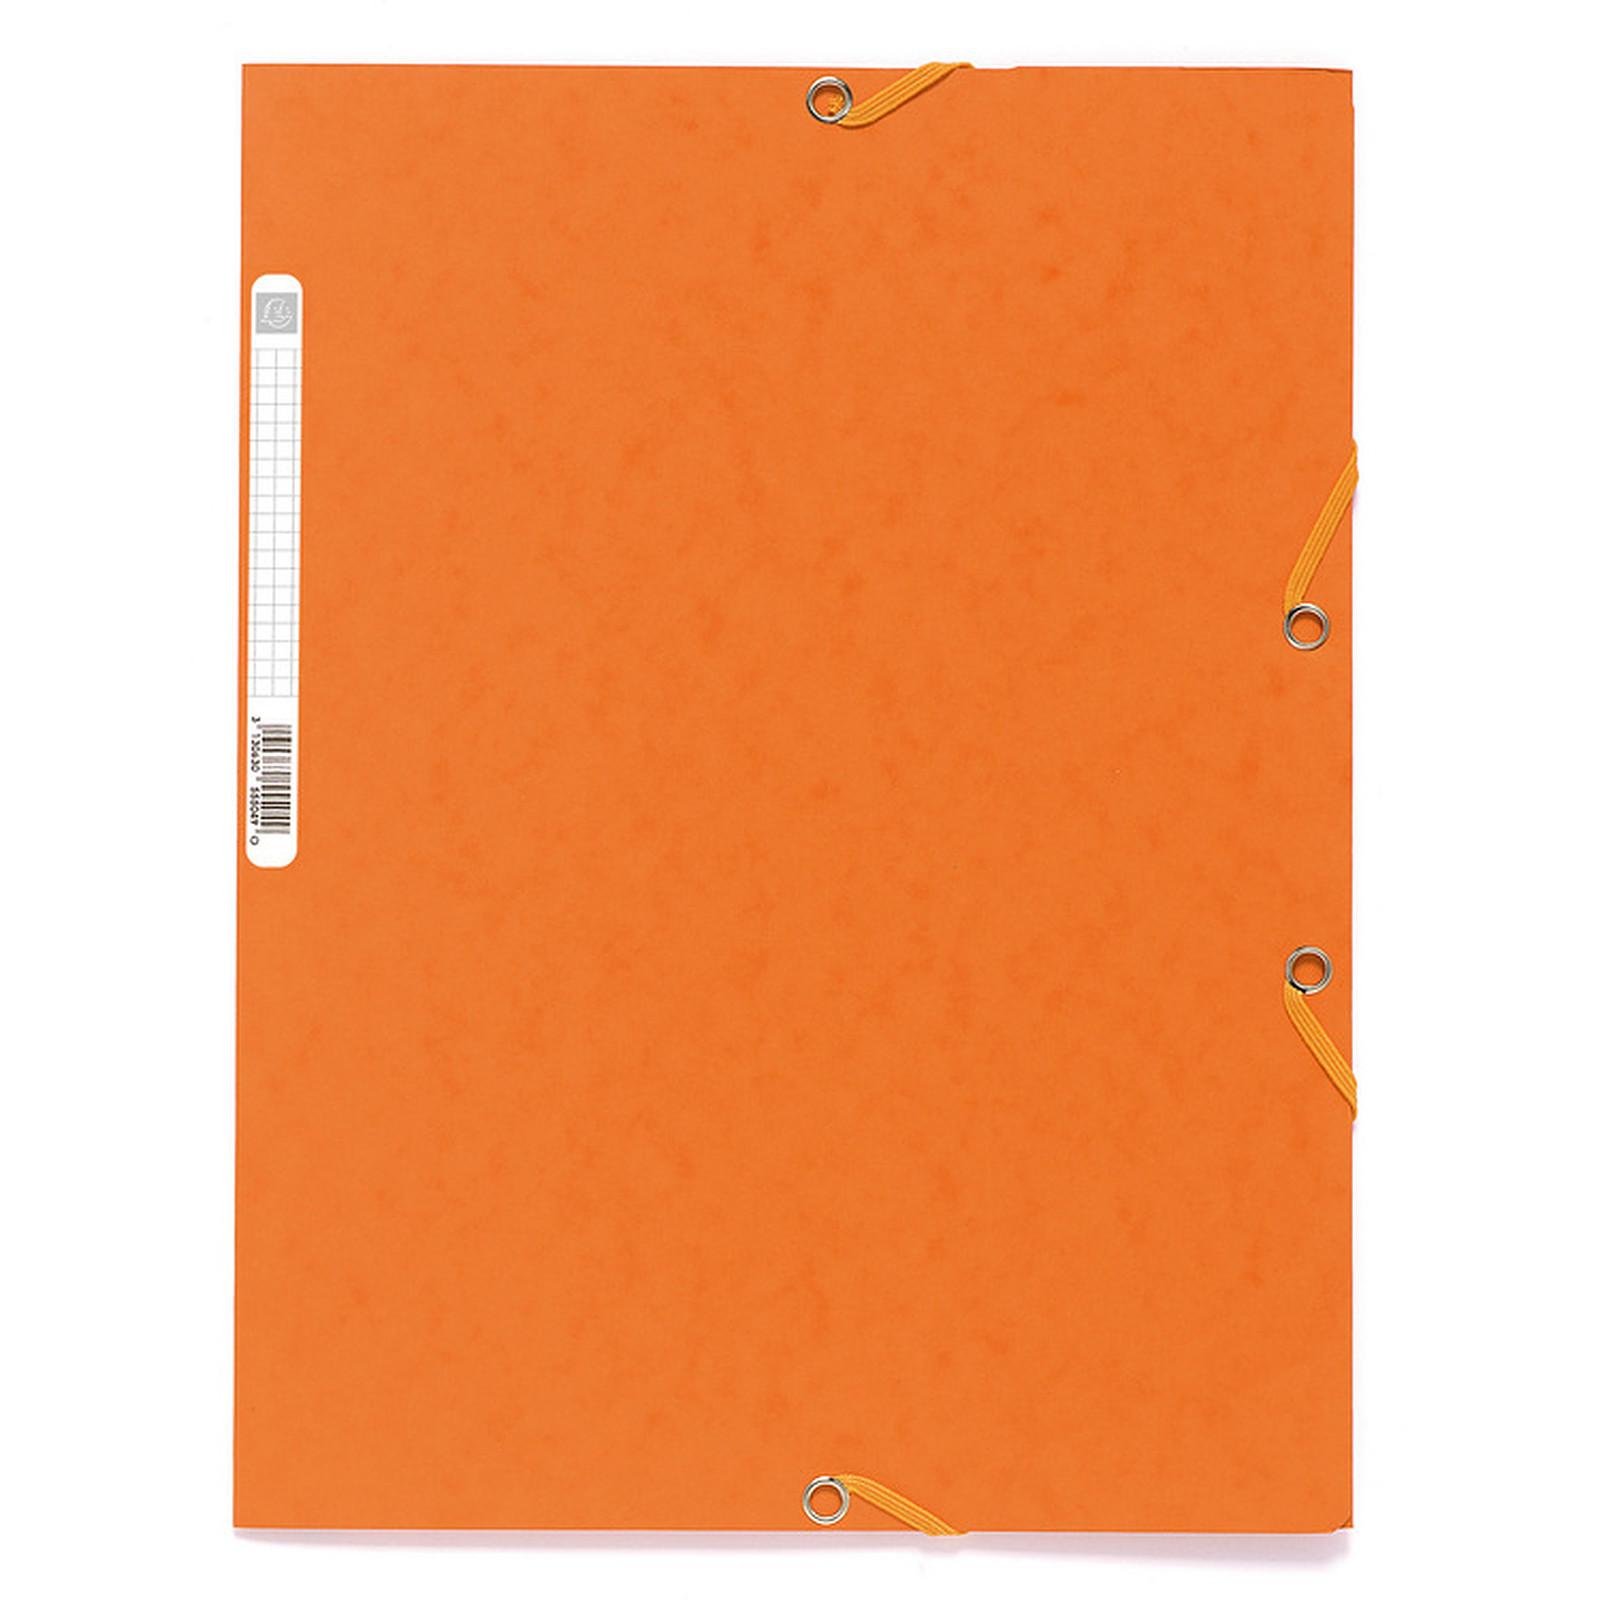 Exacompta Chemises 3 rabats élastiques 400g Orange x 25